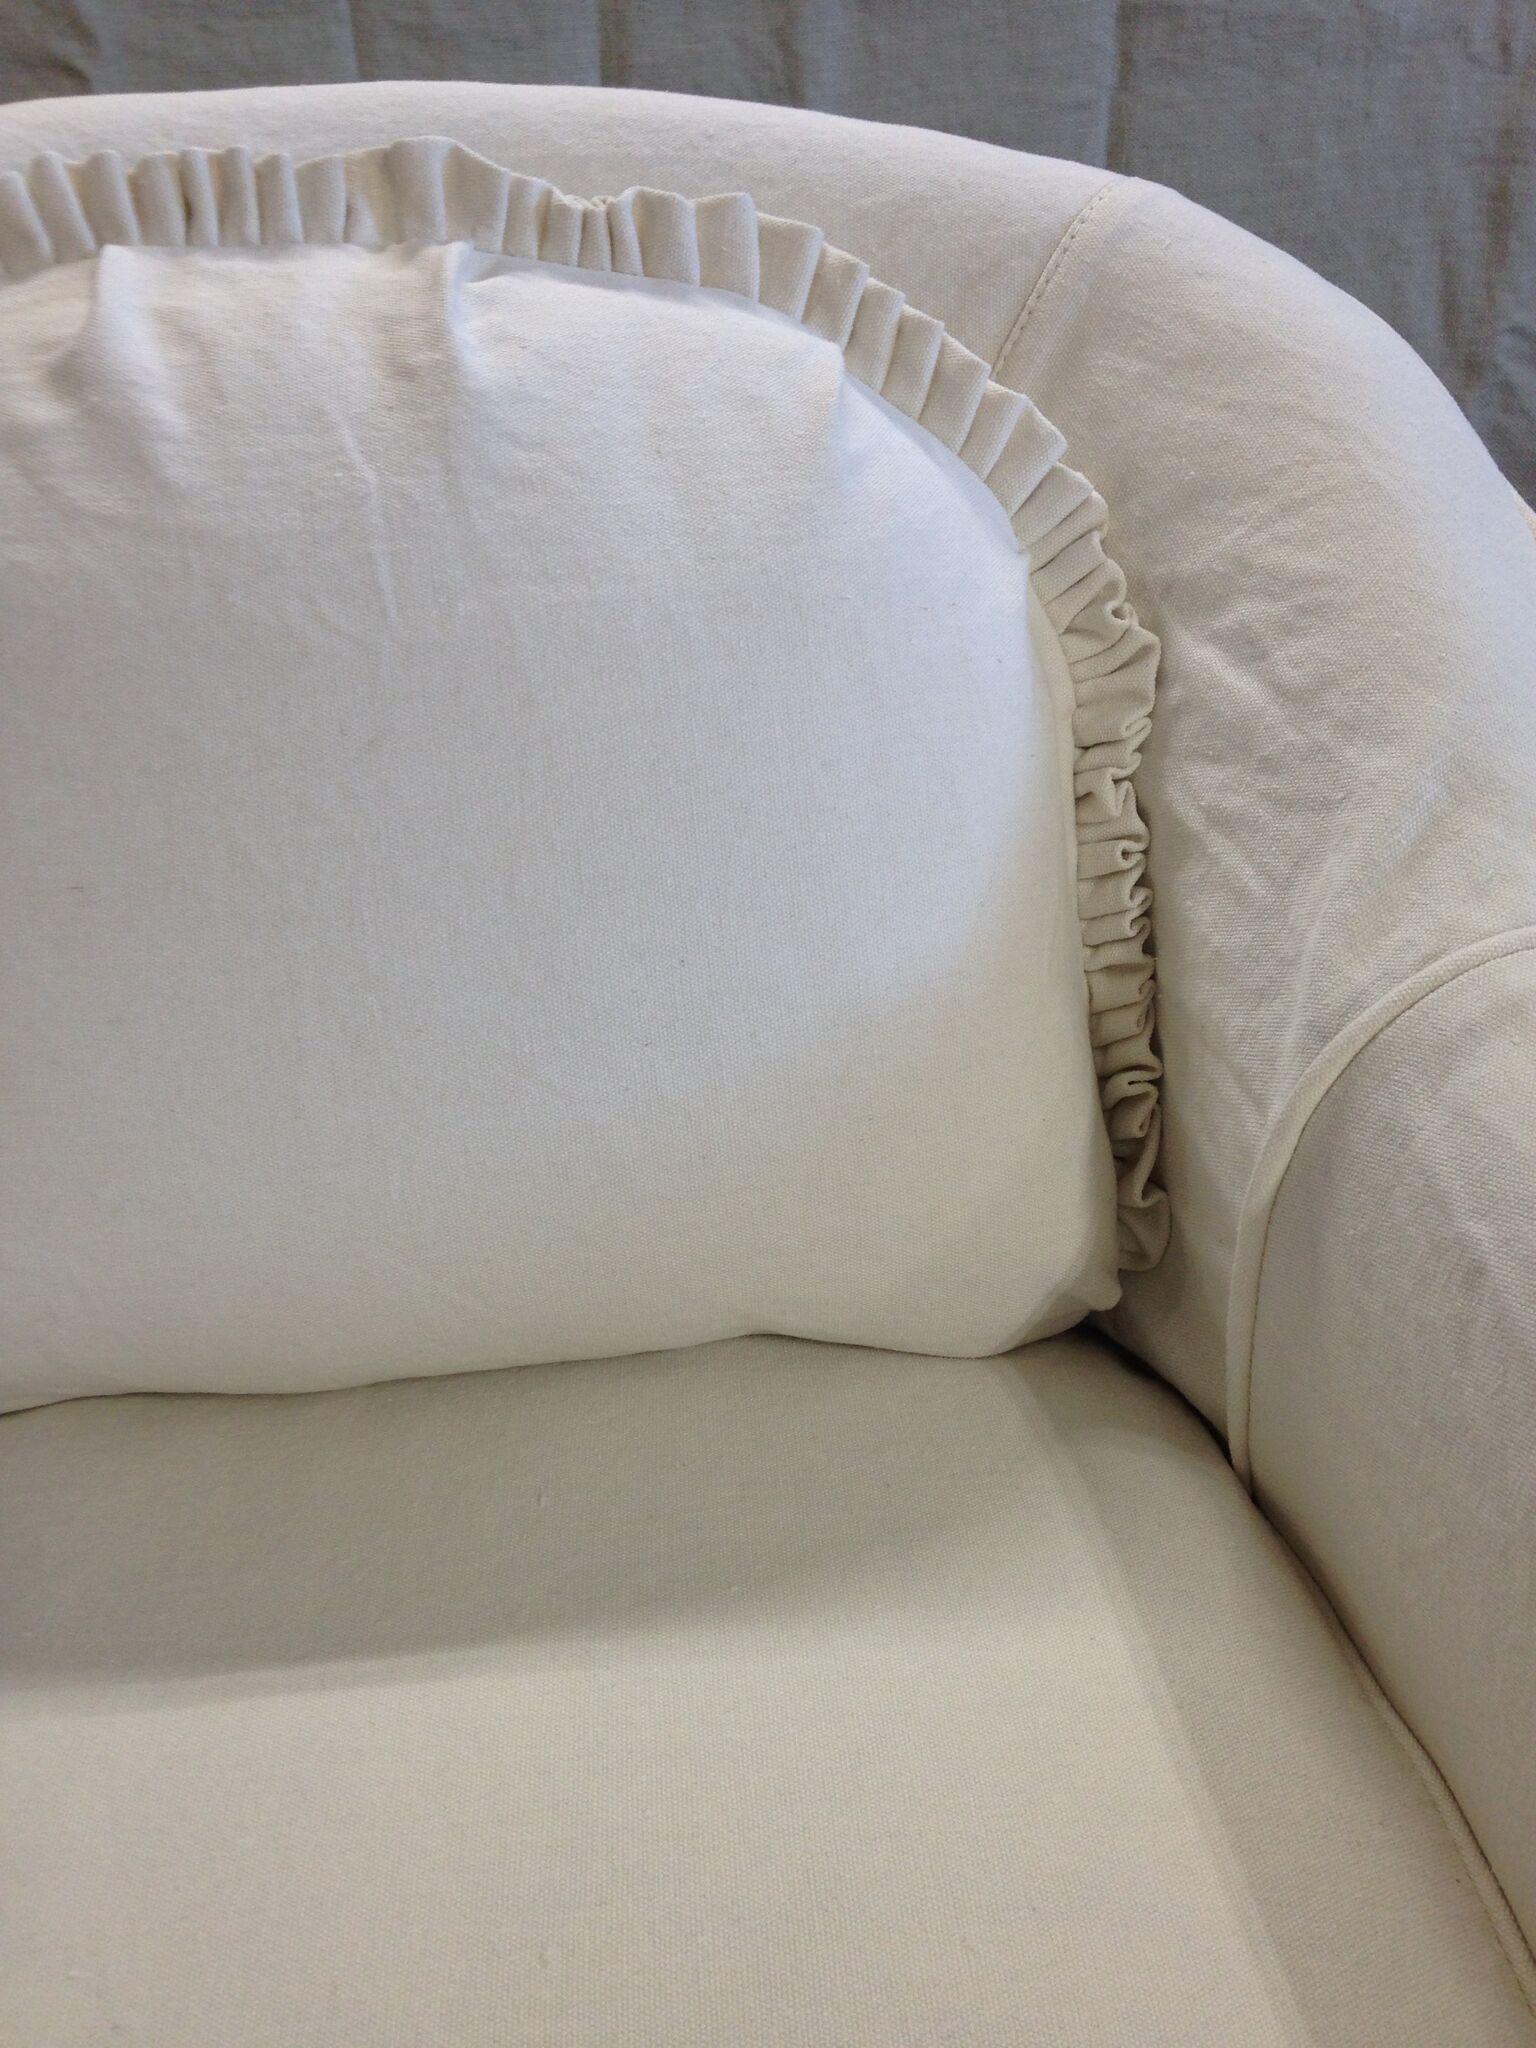 Fabric 8 Slipcovers image 46